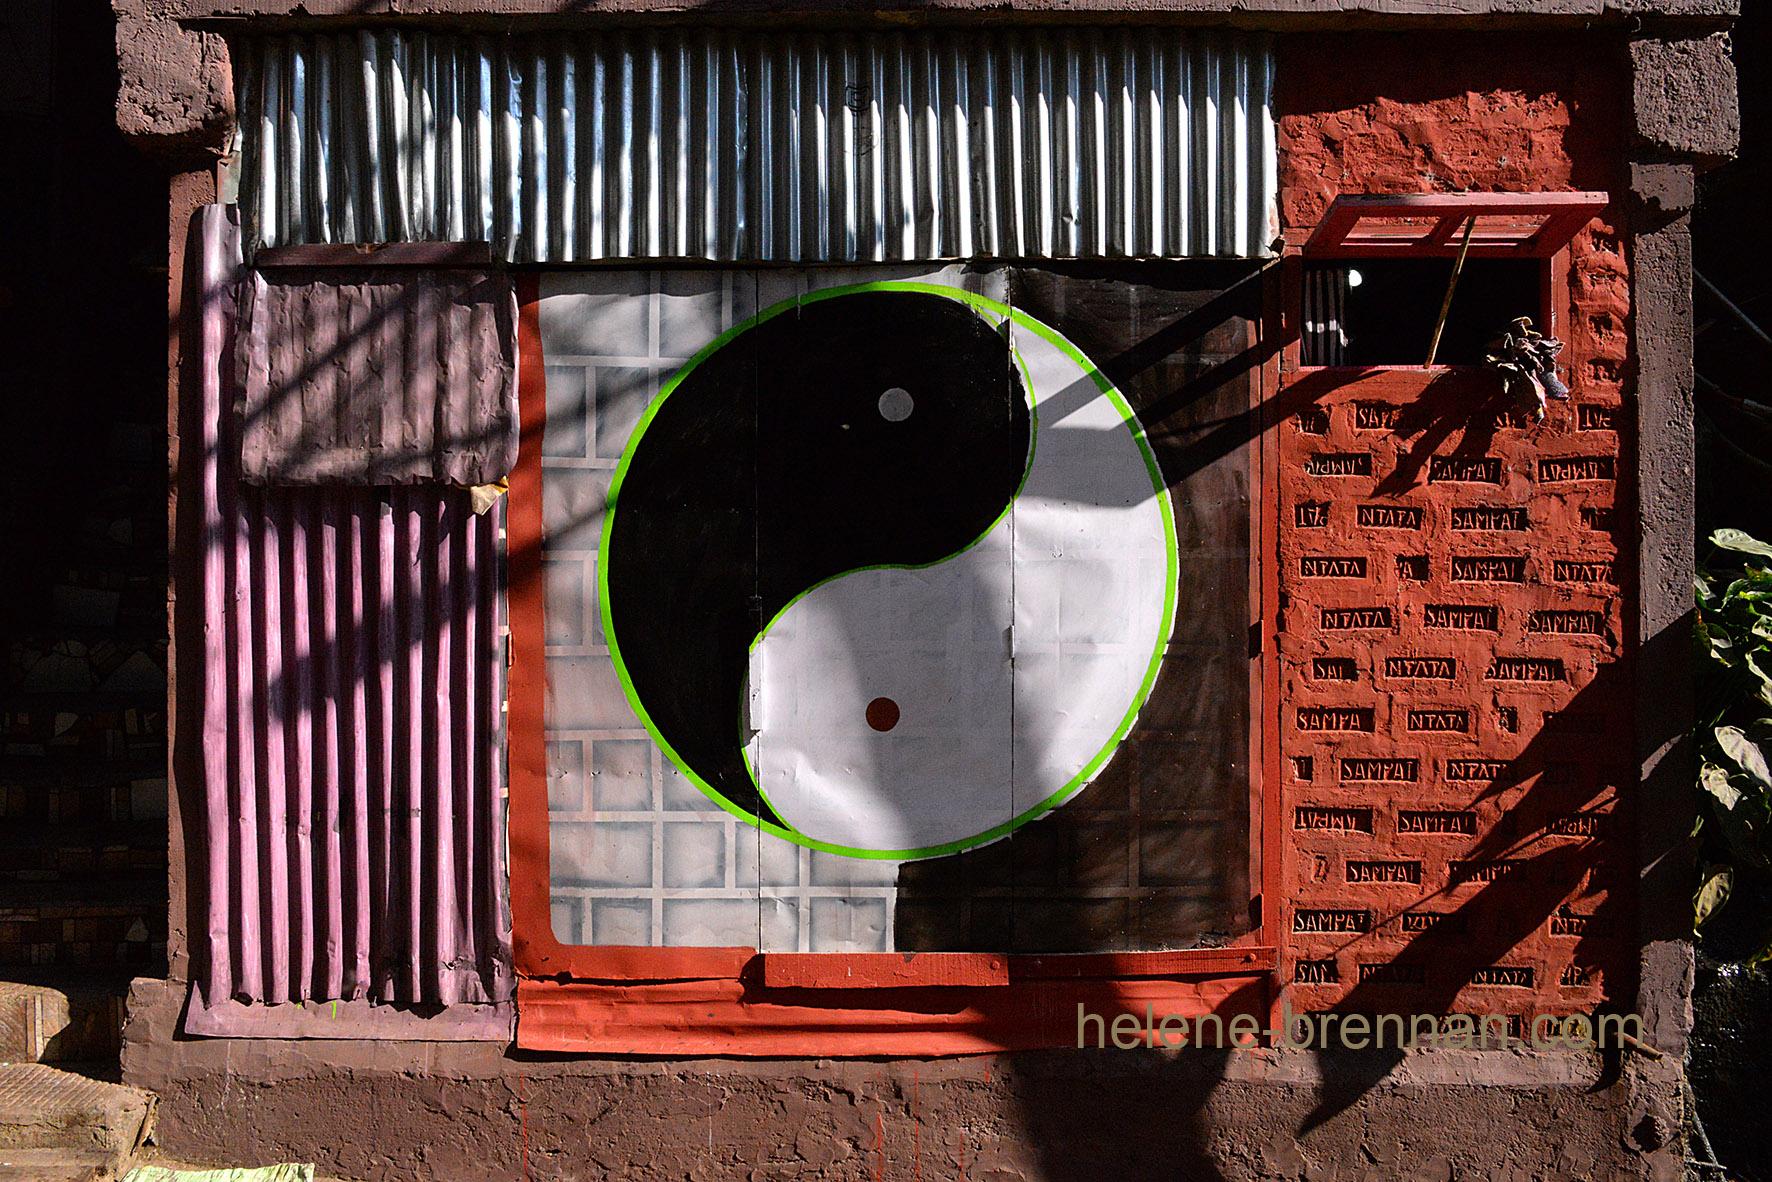 DSC_1057 aizawl ying yang